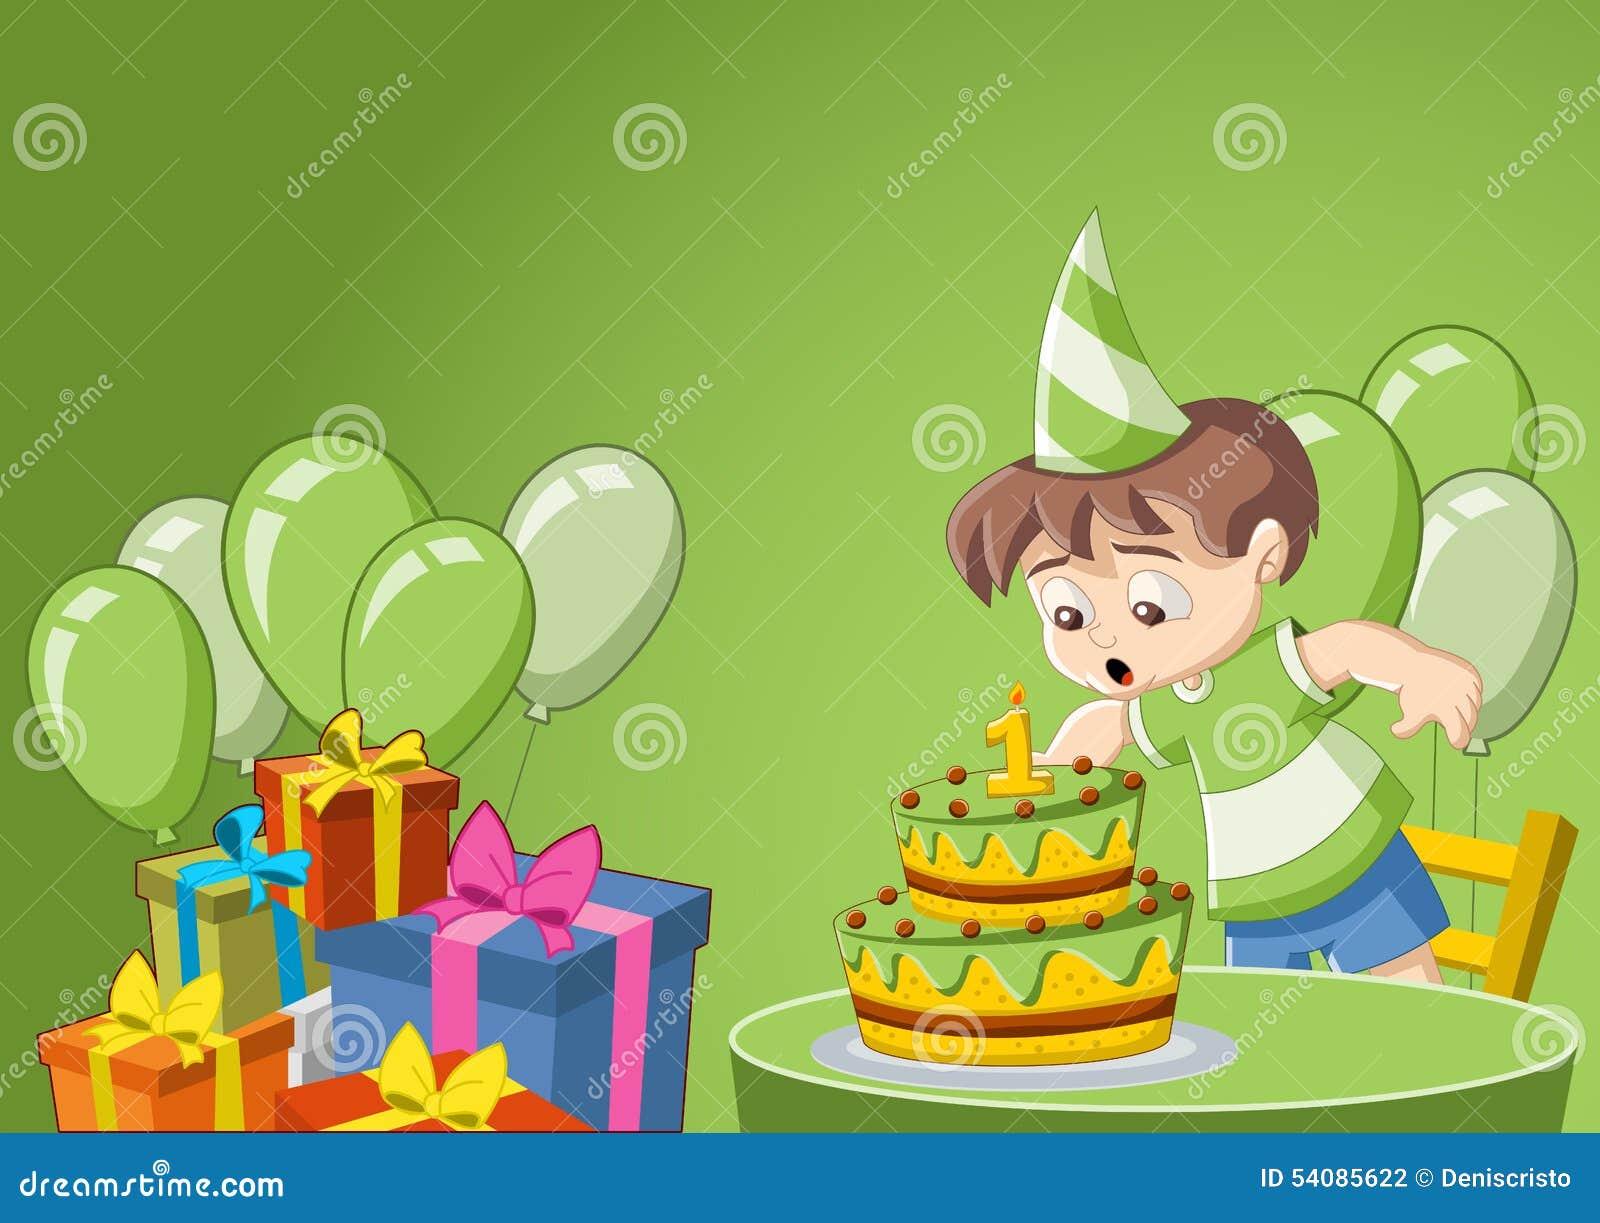 Cartoon Boy At Birthday Party Stock Vector - Illustration of